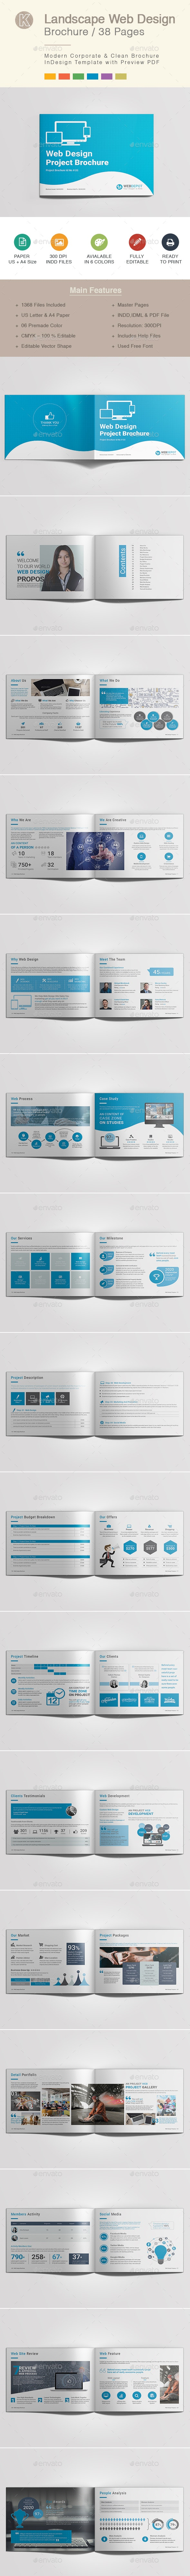 Landscape Web Design Brochure - Corporate Brochures